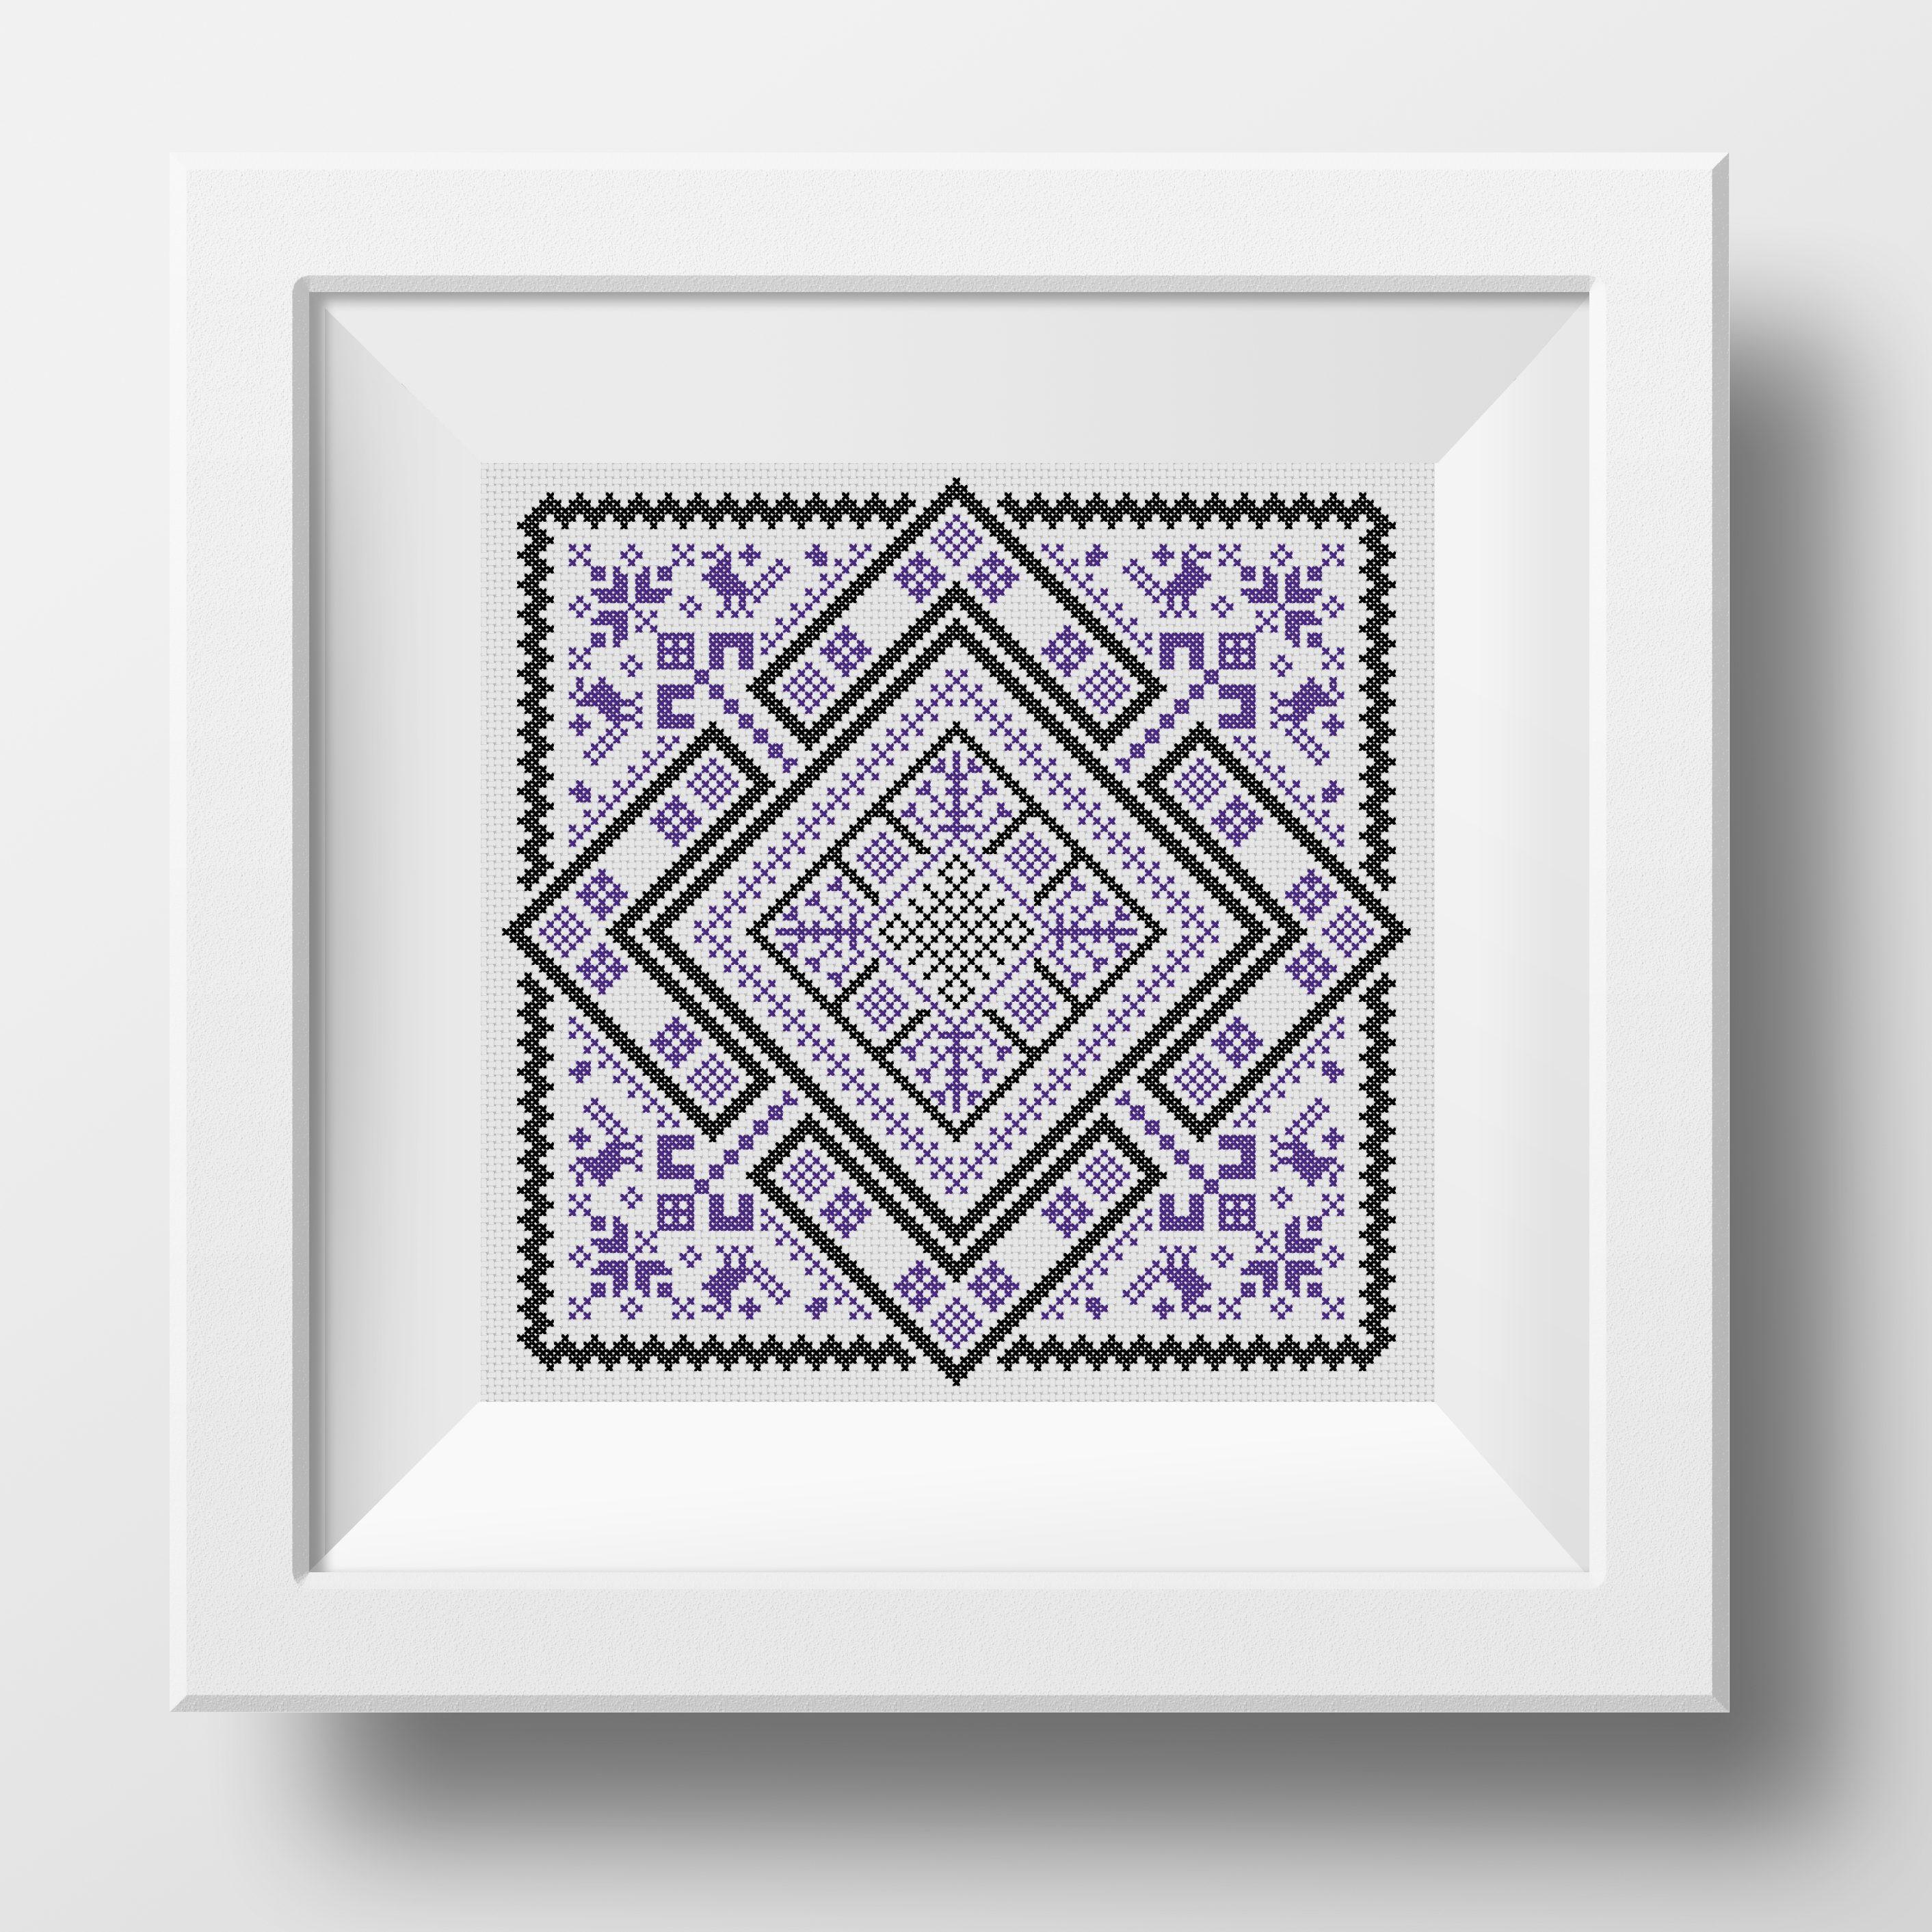 Swedish Rhombus Folk Embroidery pdf pattern with birds in cross stitch